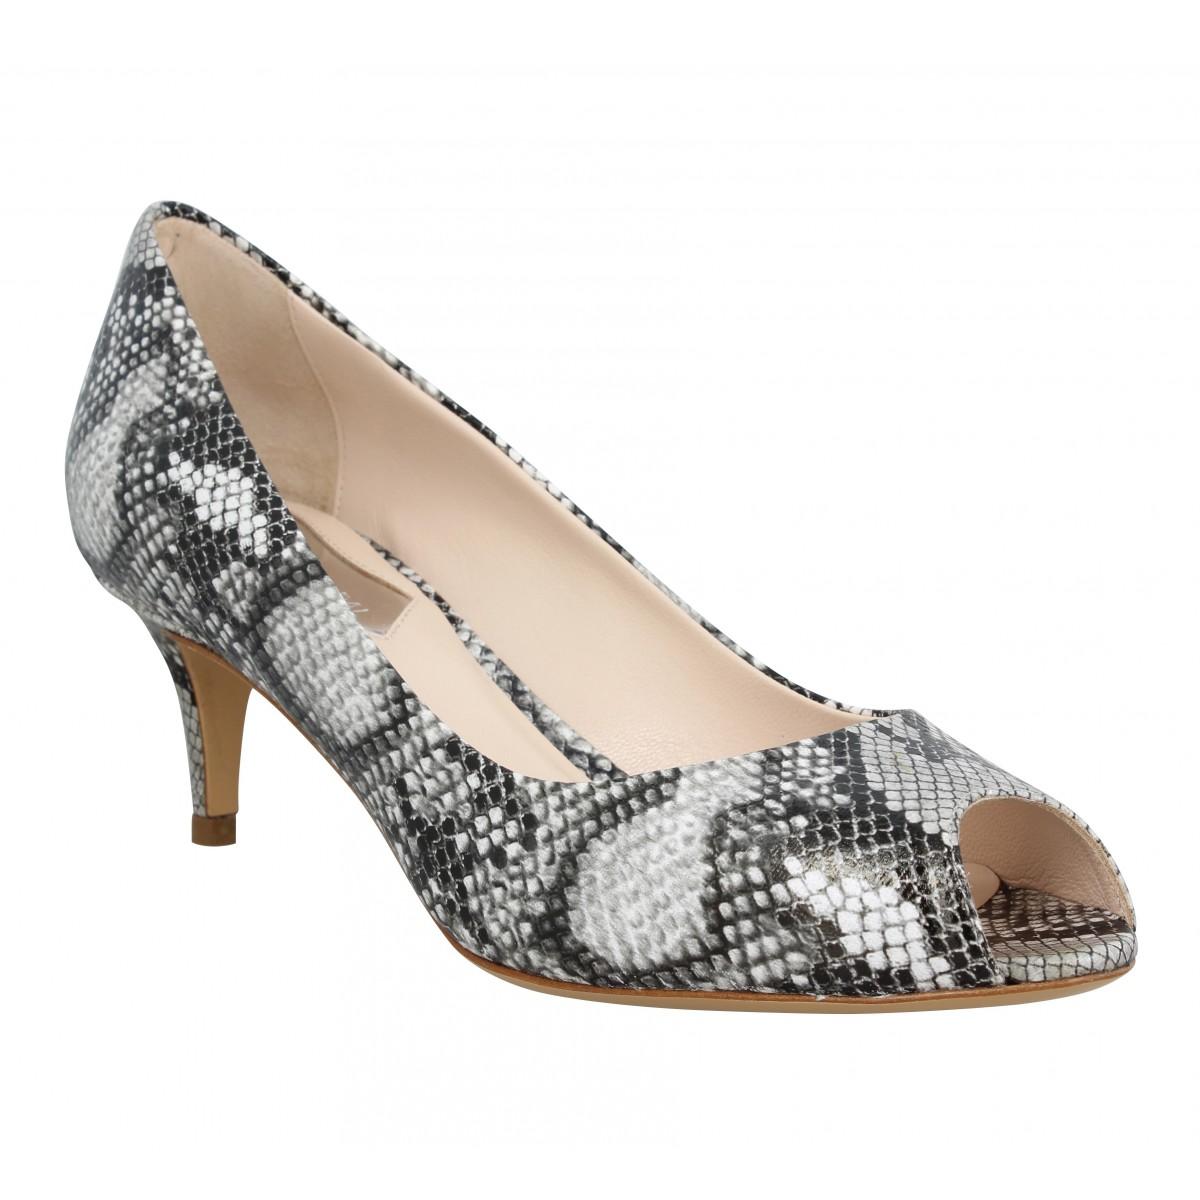 Sandales talons ATELIER MERCADAL 7020 python Femme Gris